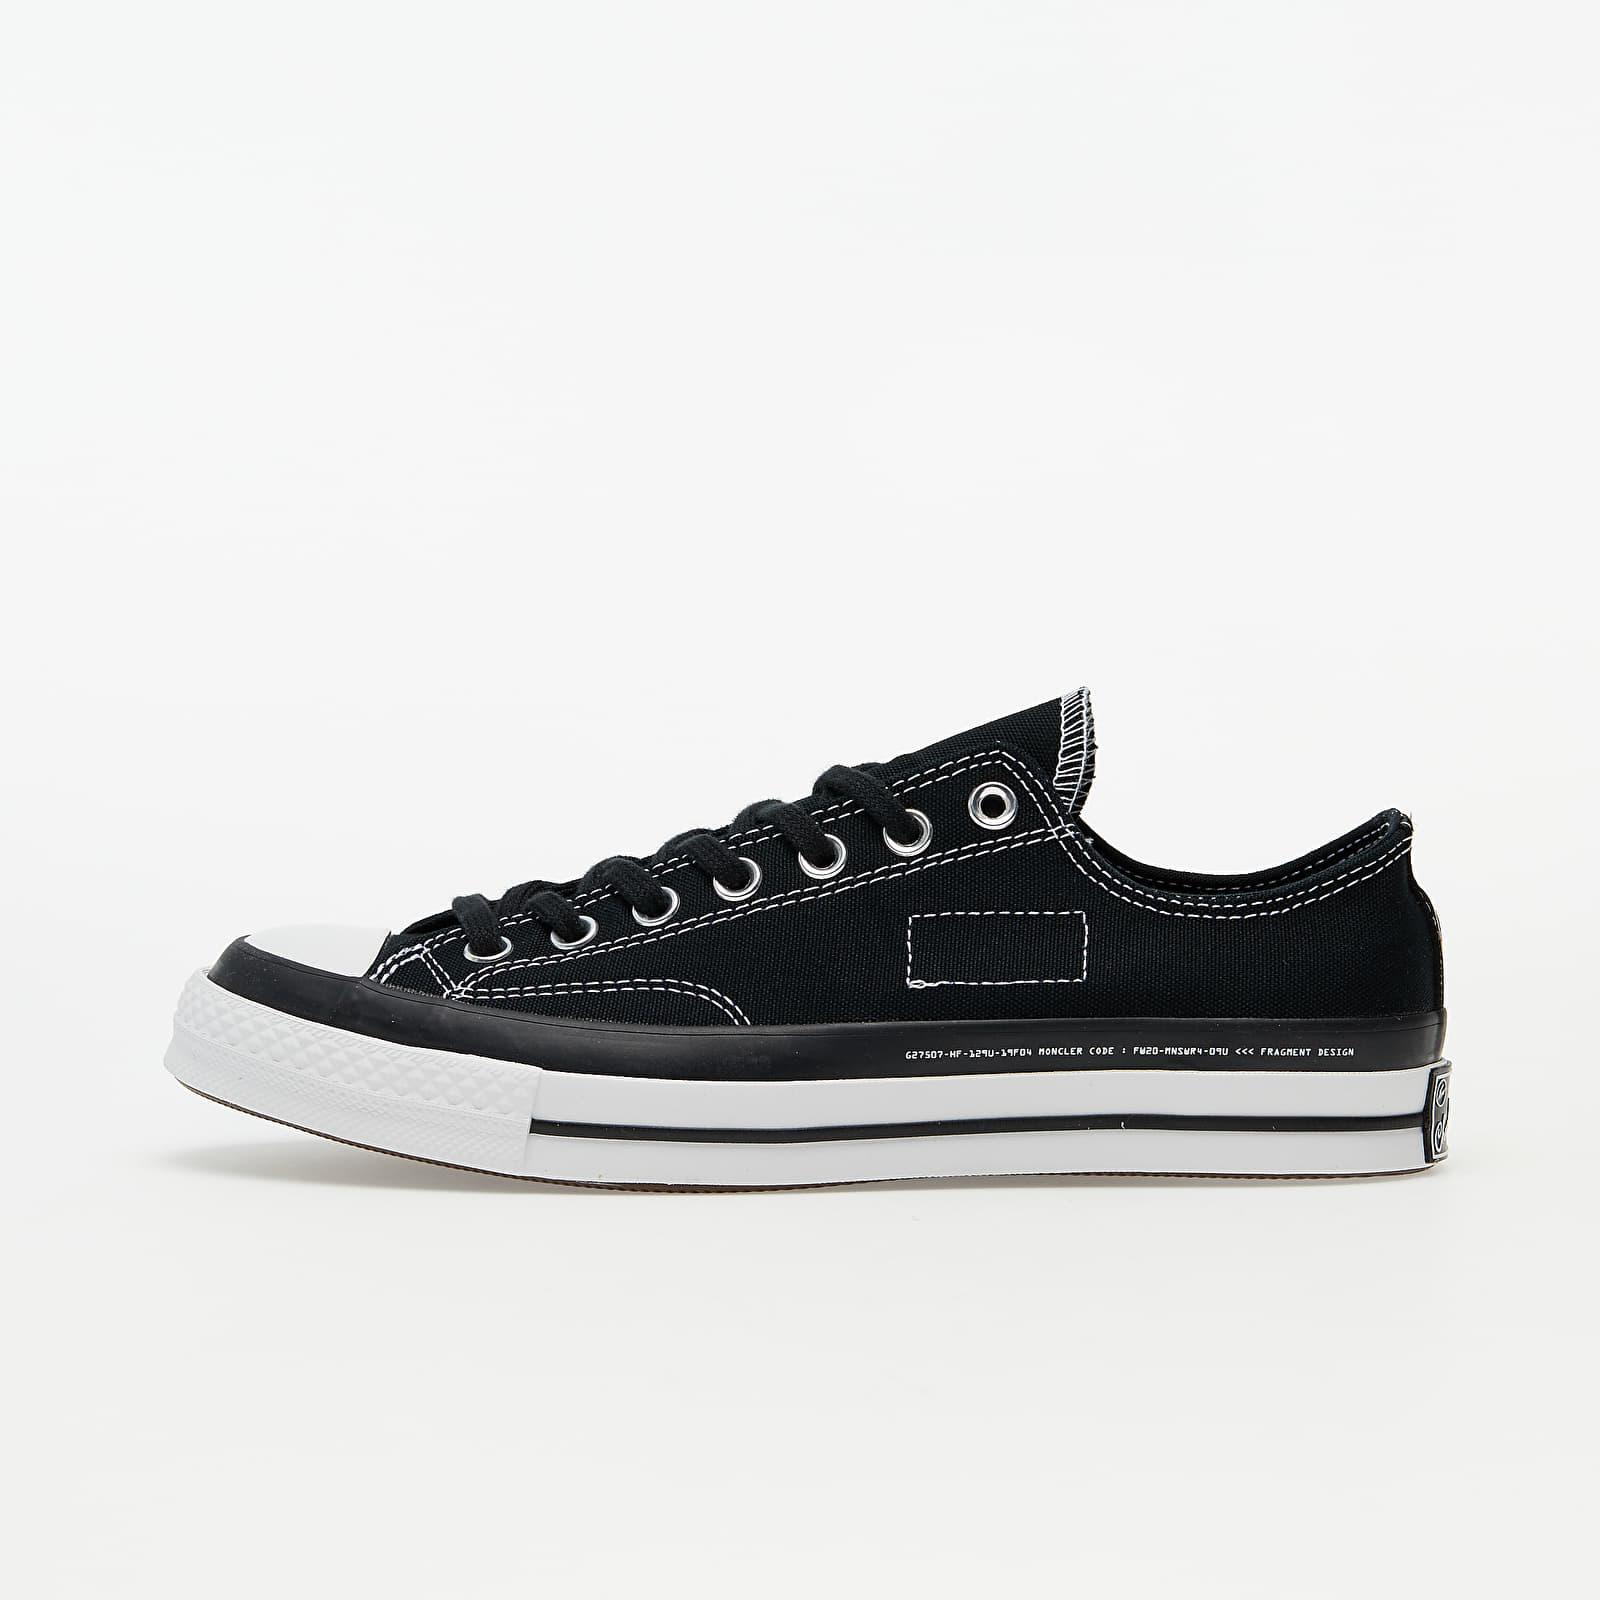 Мъжки кецове и обувки Converse x Fragment Design x Moncler Chuck 70 OX Black/ White/ Black